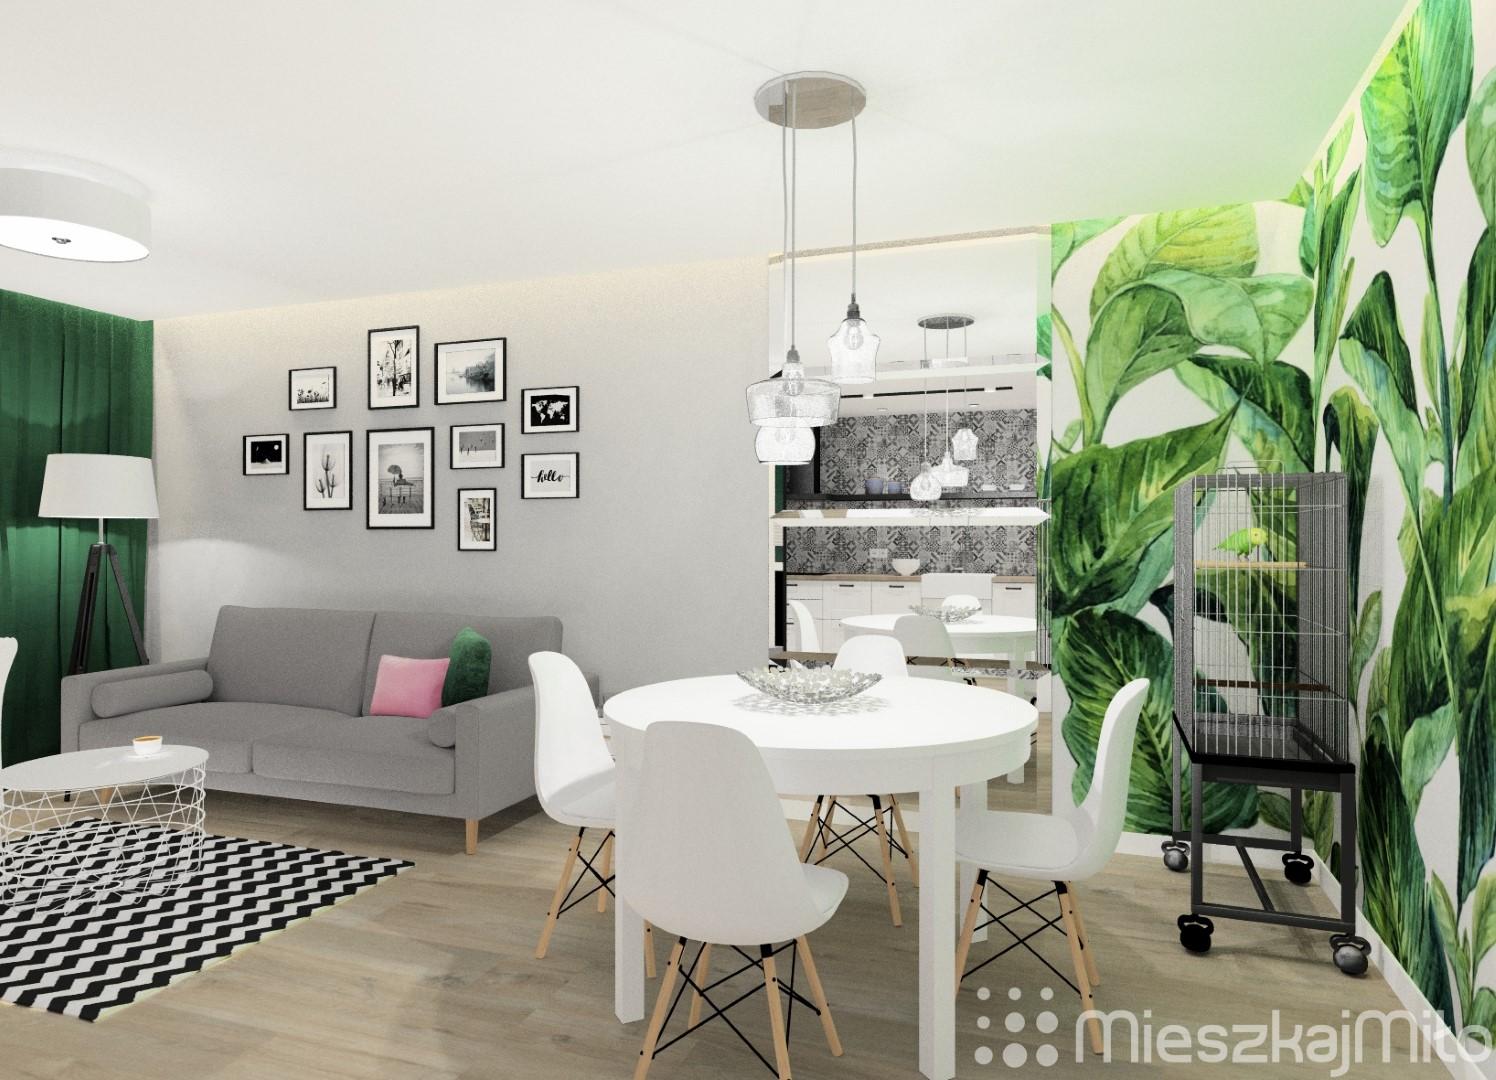 Projekt Salonu Z Aneksem Kuchennym 26 7 M Sosnowiec Mieszkaj